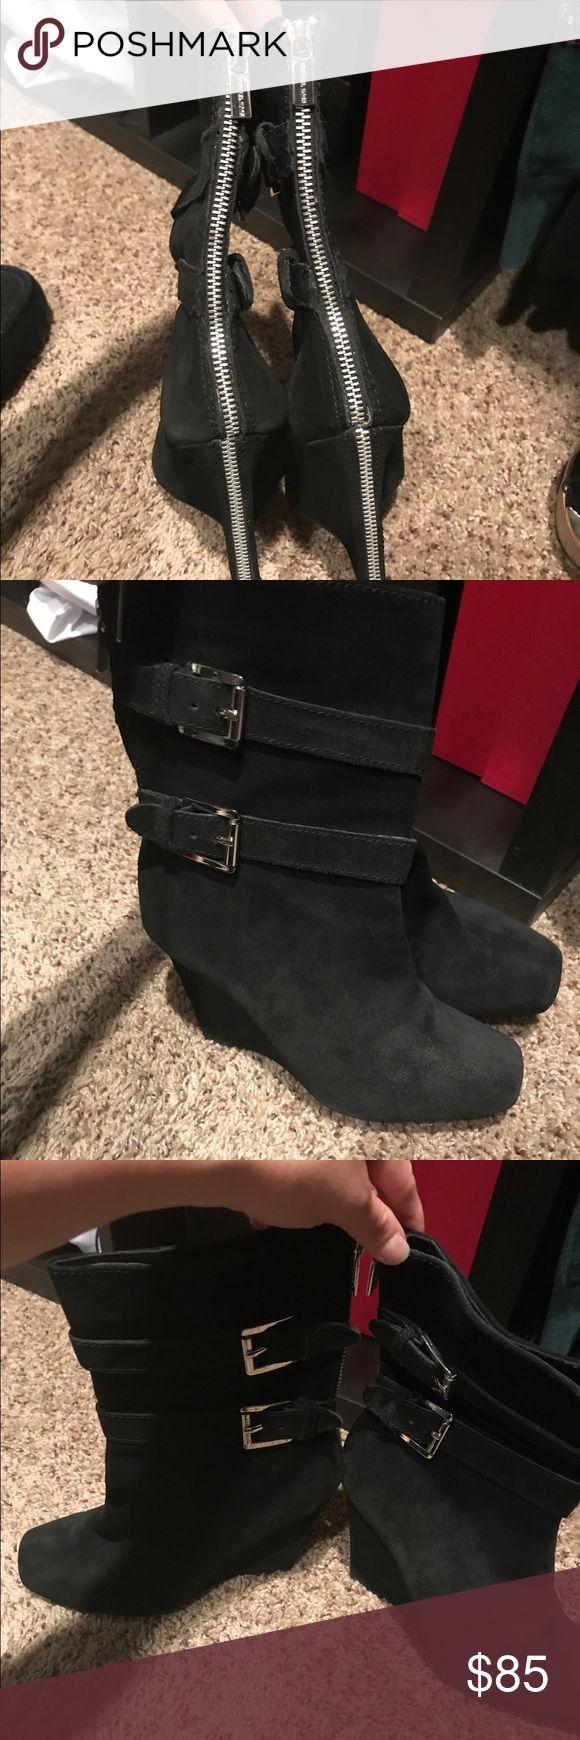 Michael kors parker wedge boots 7 Michael kors parker wedge boots 7 Michael Kors Shoes Wedges